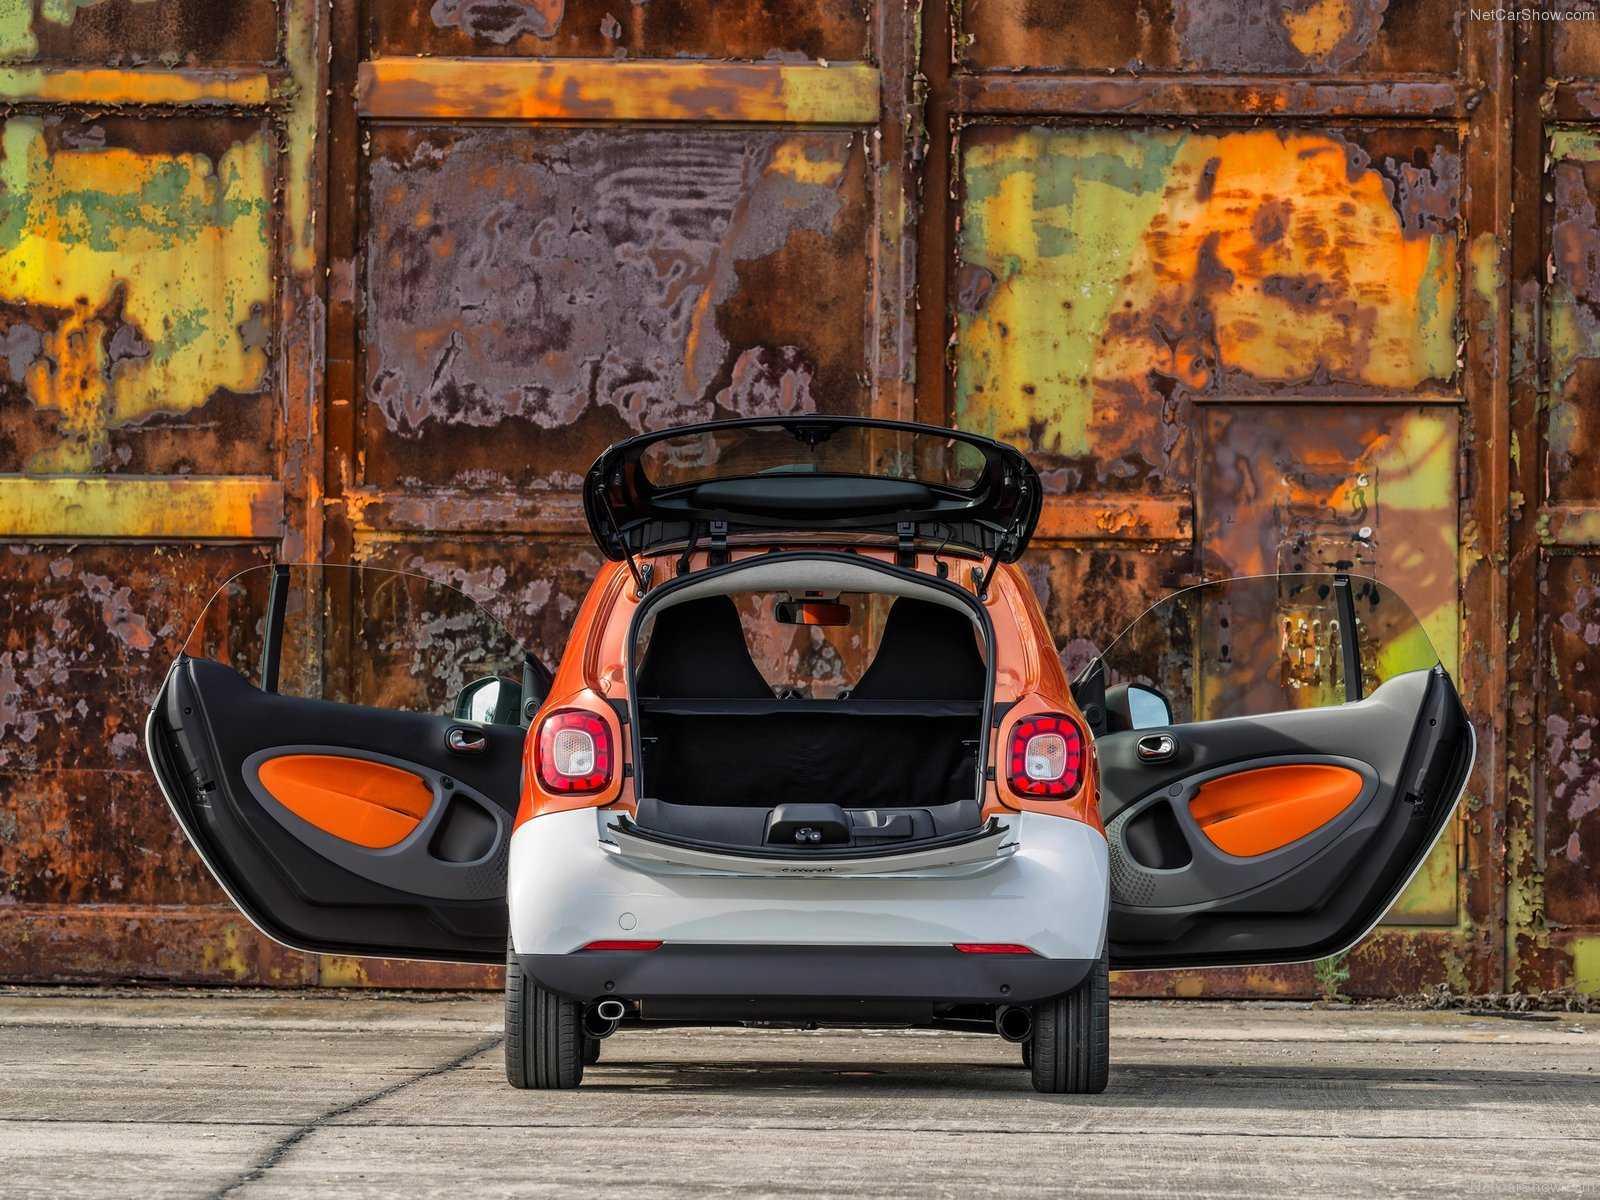 Smart fortwo cabrio - обзор, цены, видео, технические характеристики